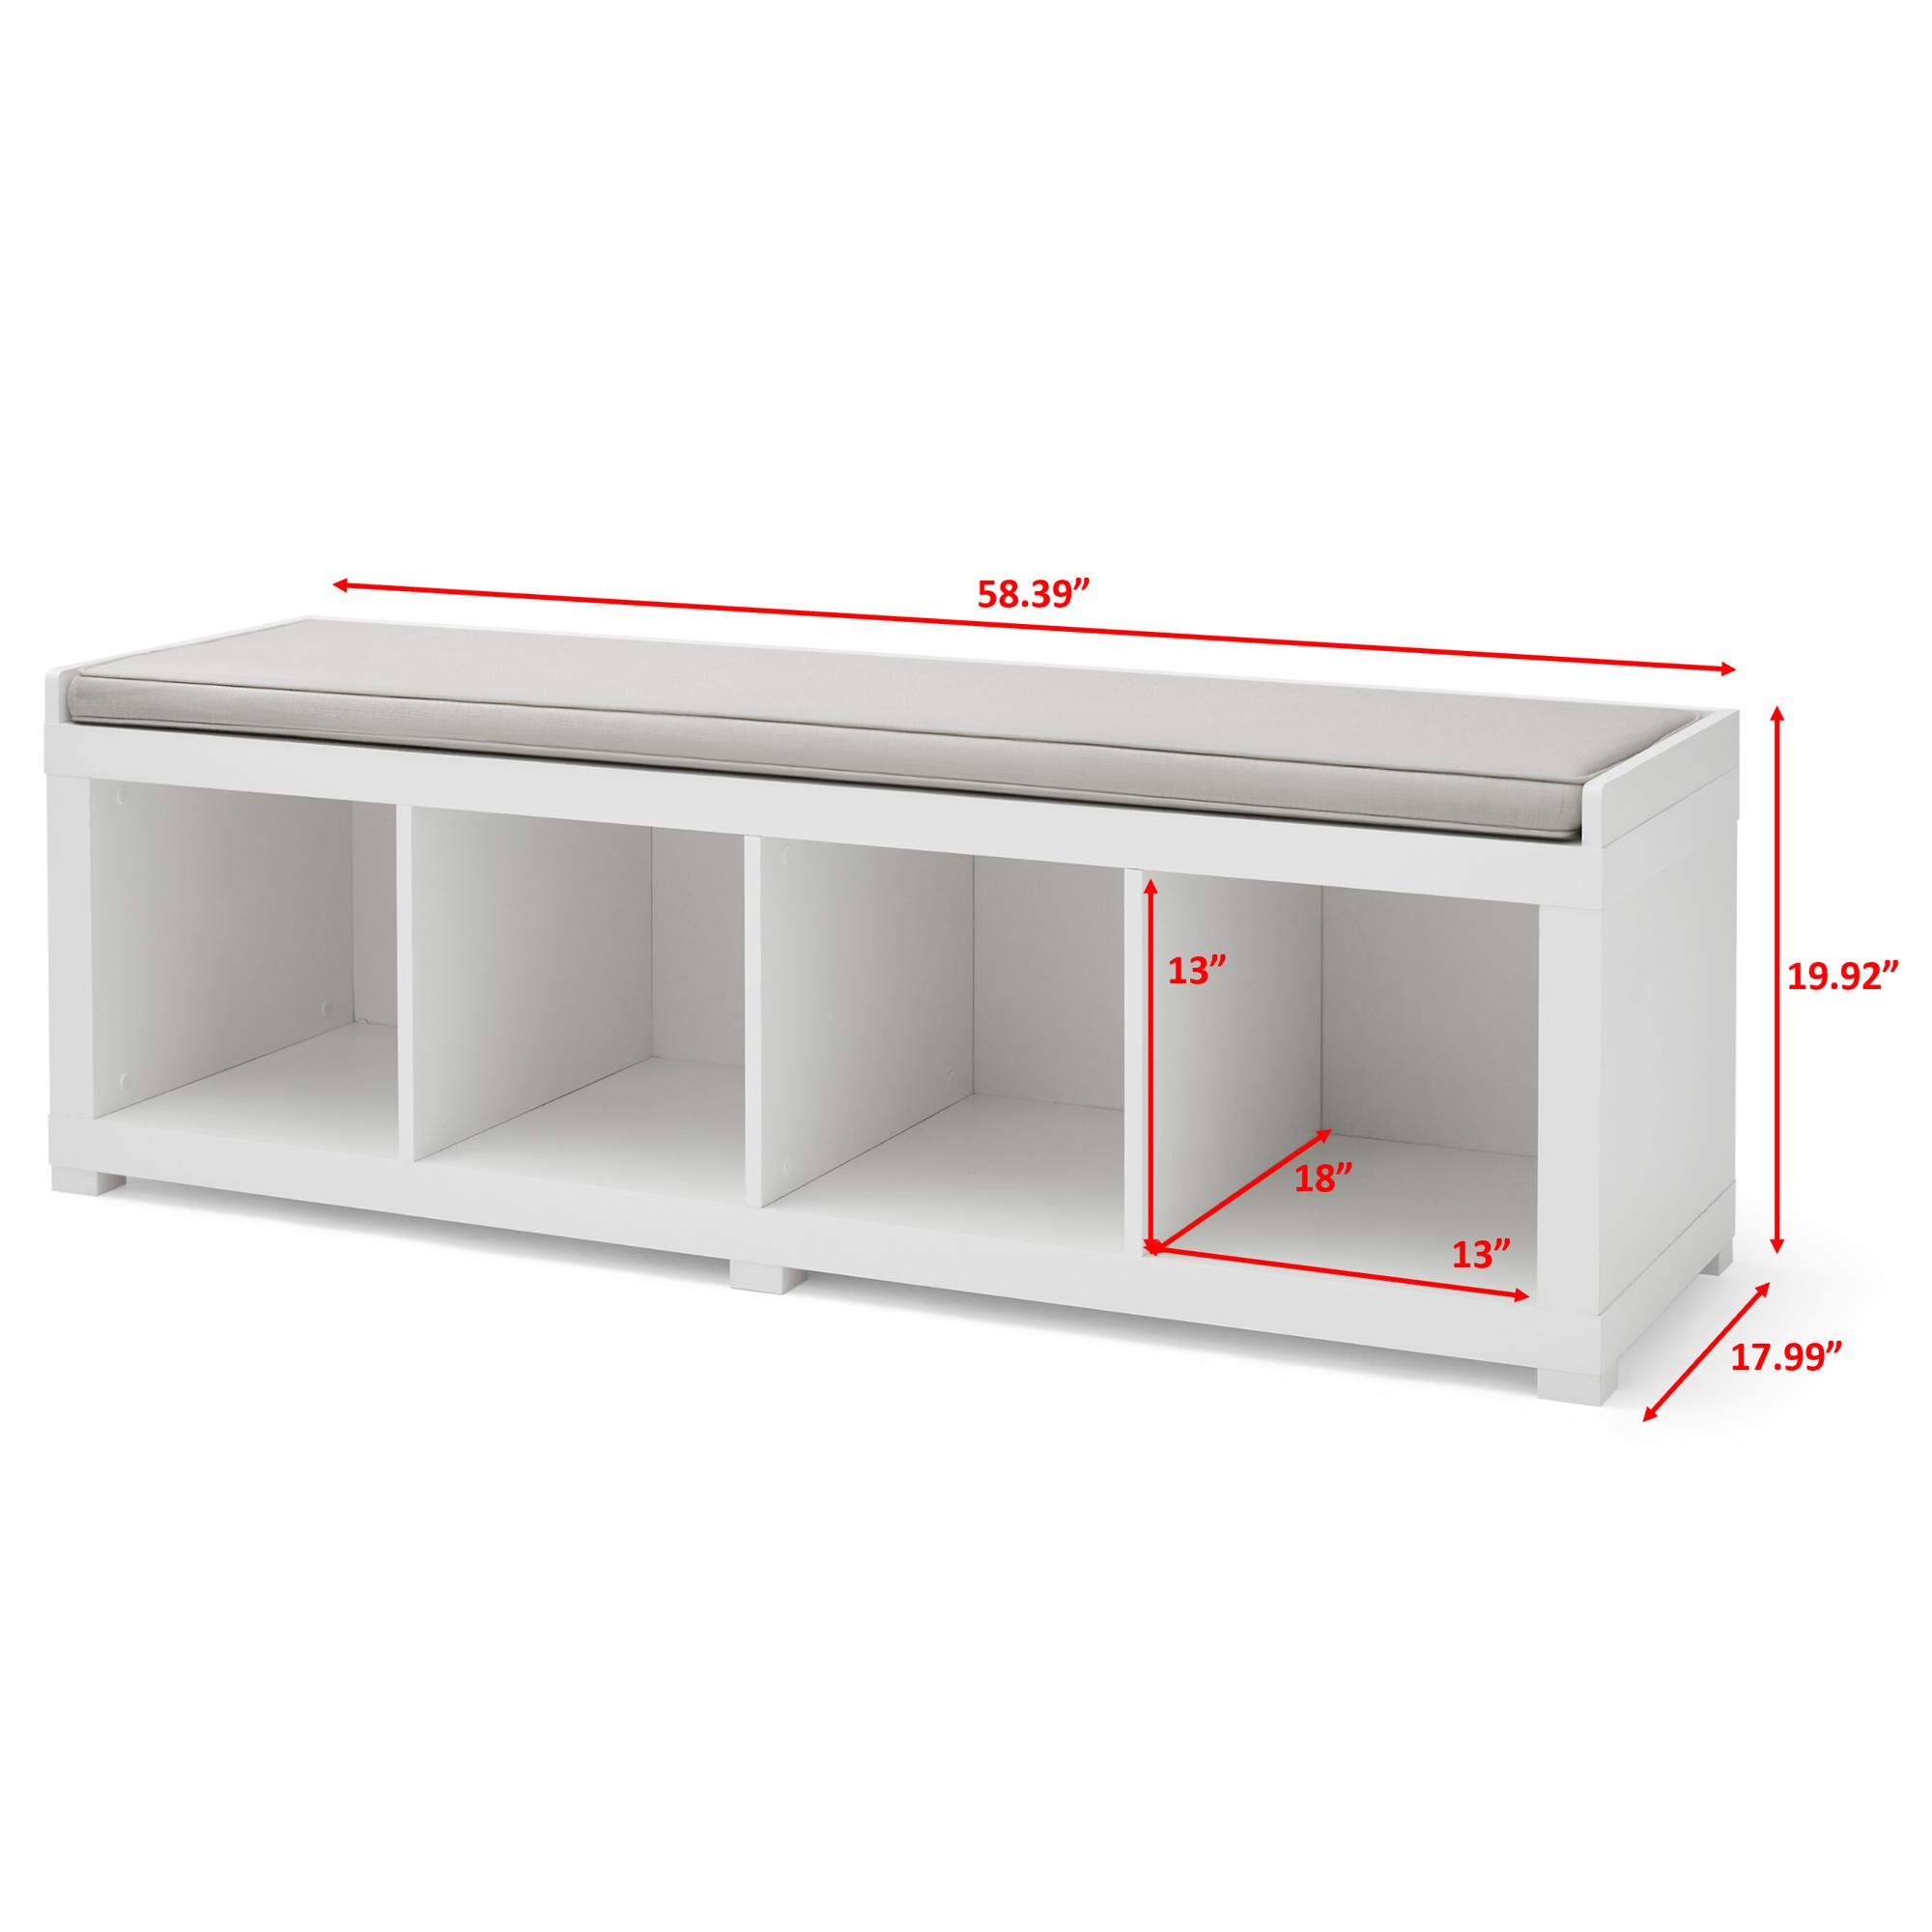 Better Homes and Gardens 4-Cube Organizer Storage Bench, White - Walmart.com